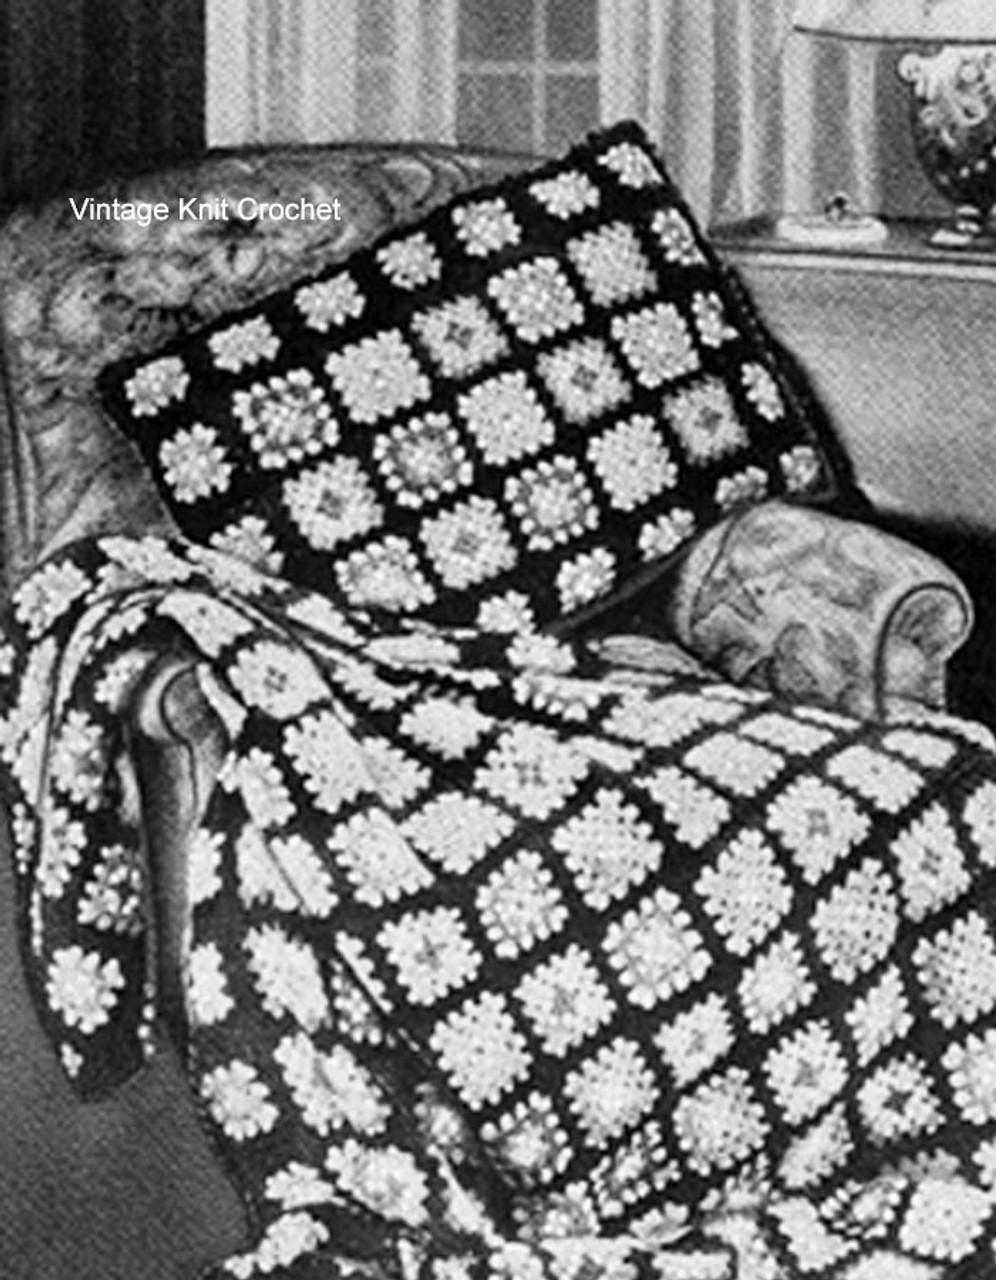 Easy granny afghan crochet pattern in Zephyr yarn